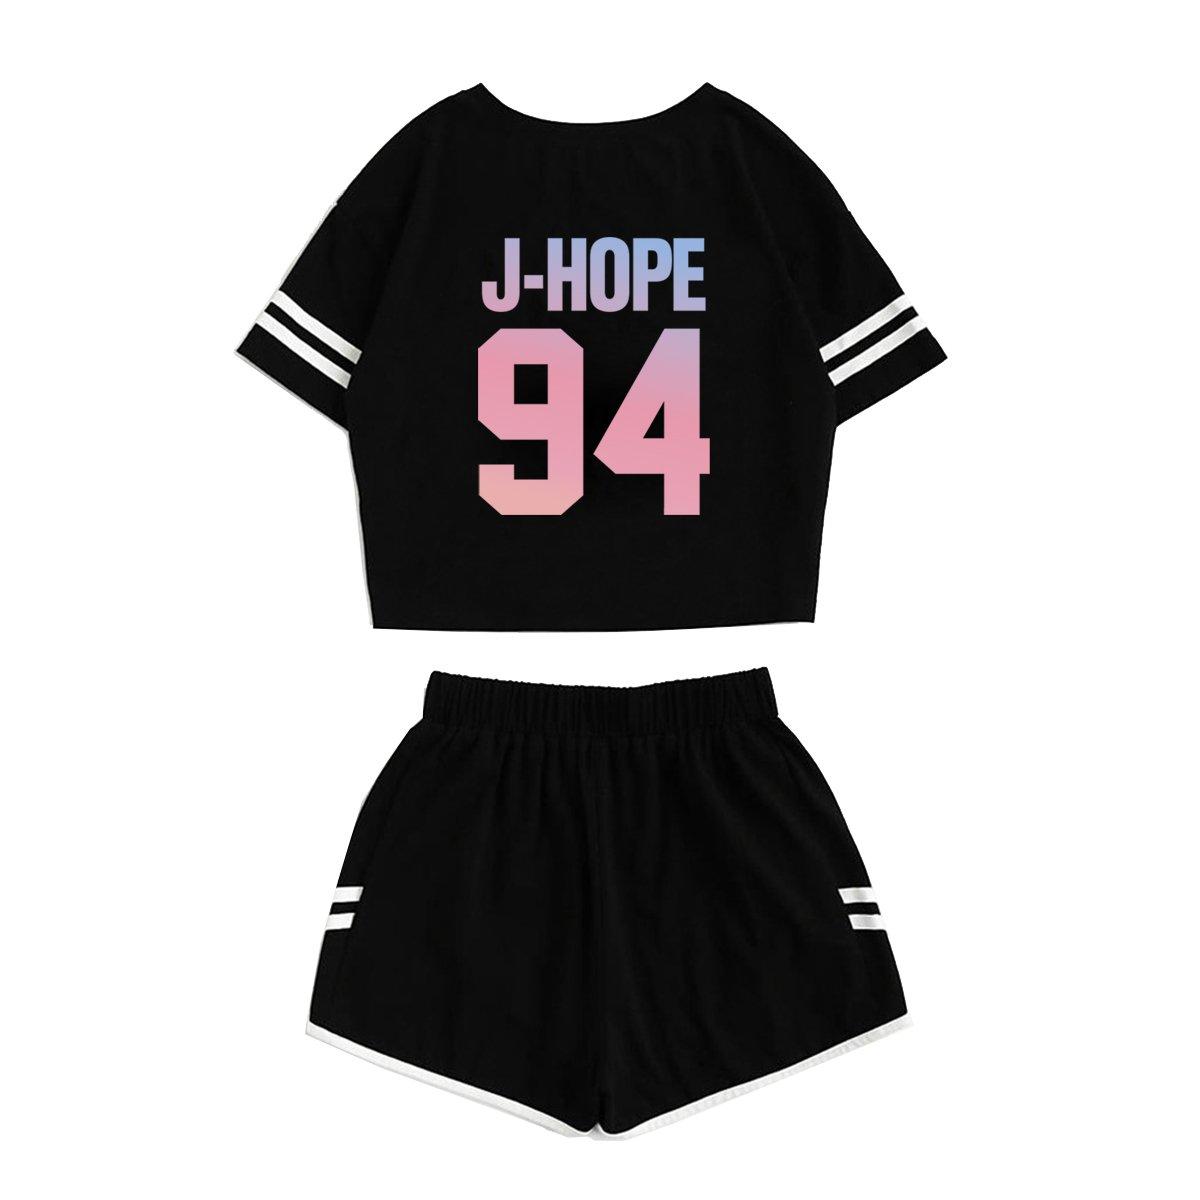 JUNG KOOK Kpop BTS Album Love Yourself:Tear Sports Hot Pants + Midriff-baring Shirts Set